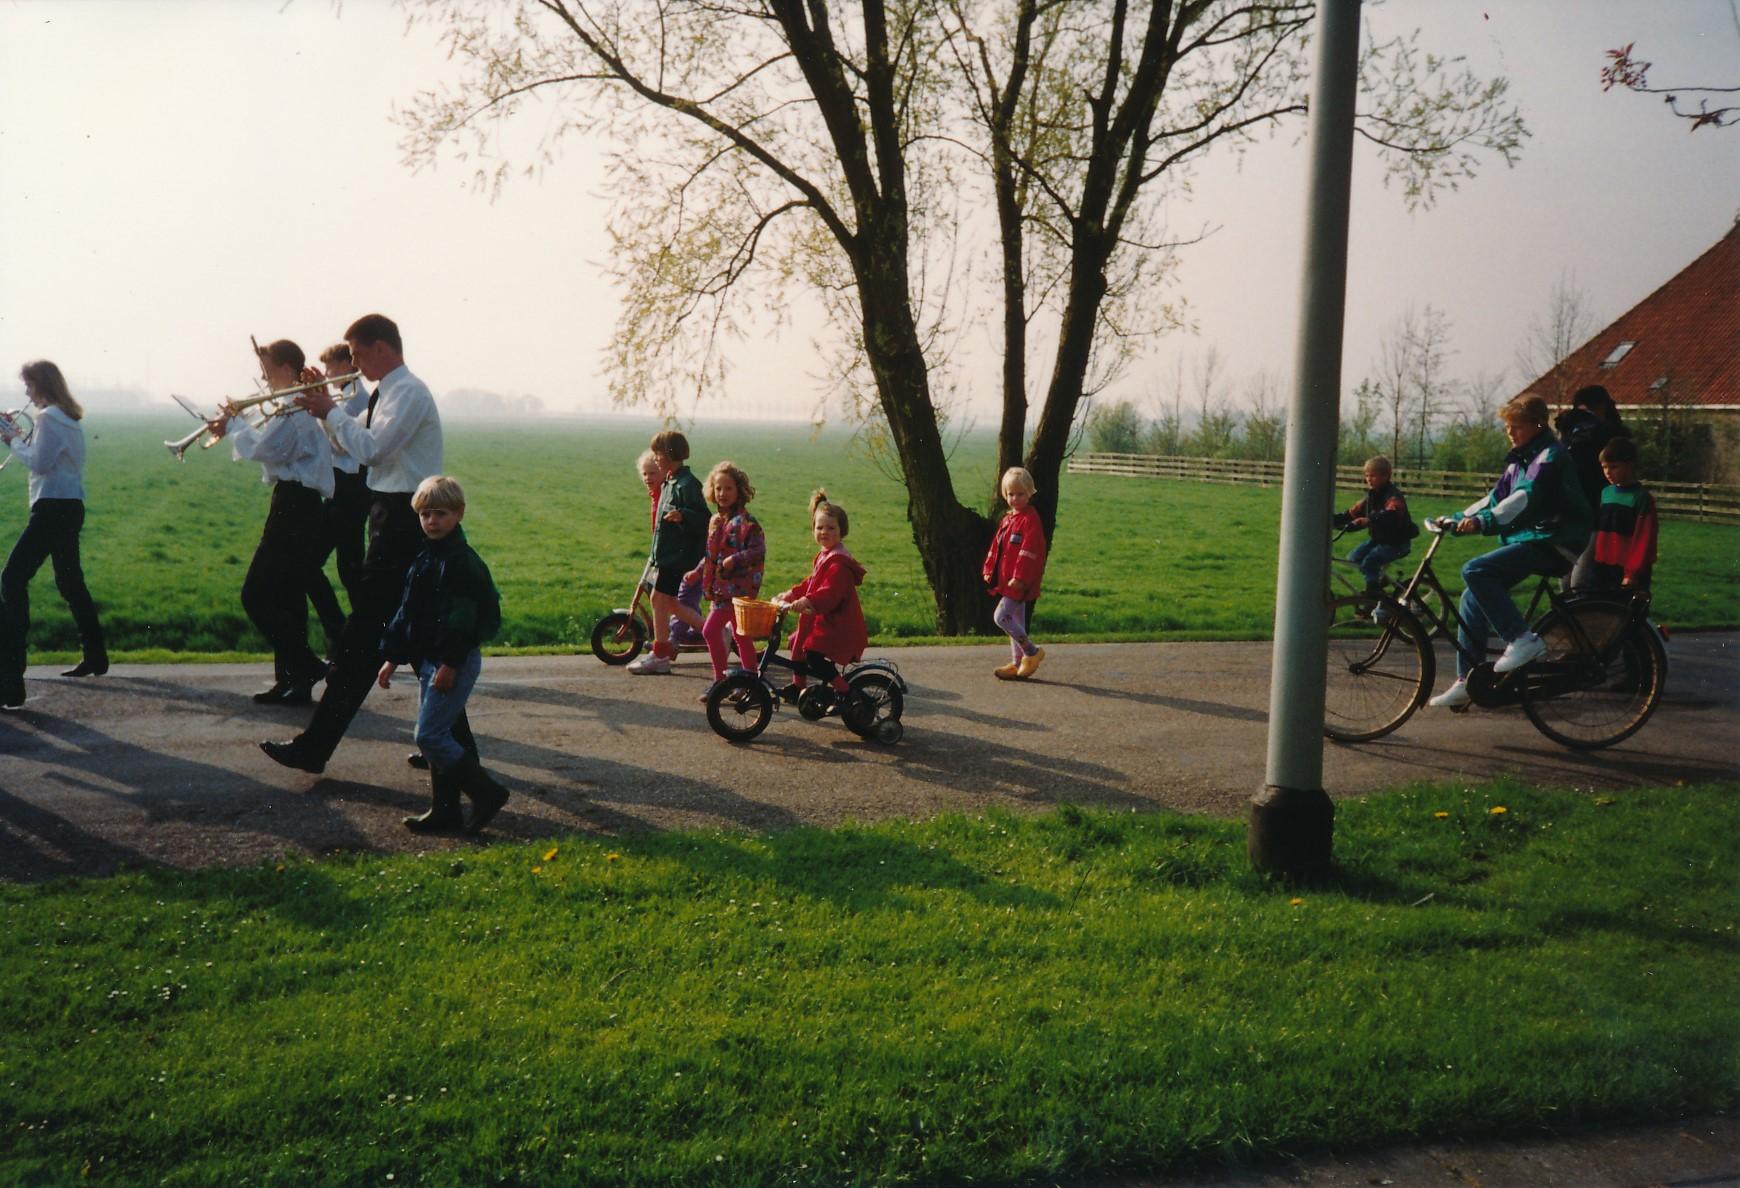 Fotoalbum Anneke Miedema, 044, Iepening klok Ald Toer, 1994